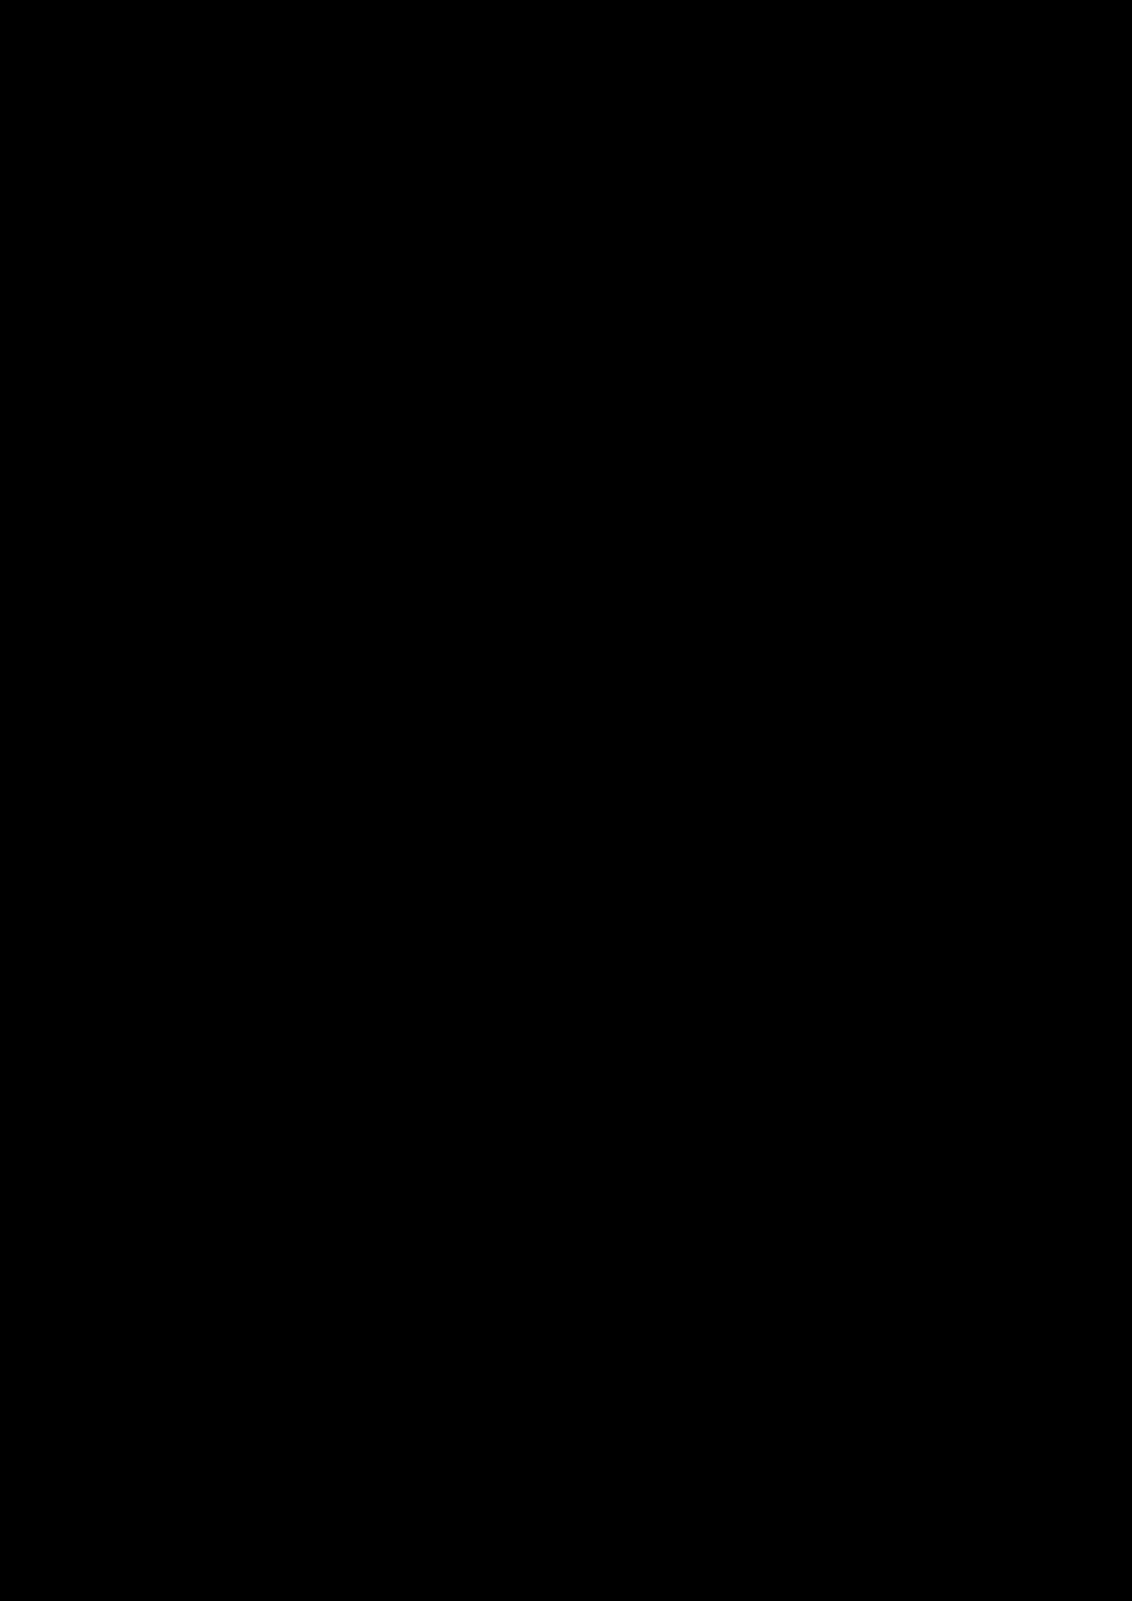 Ten lyubvi slide, Image 35